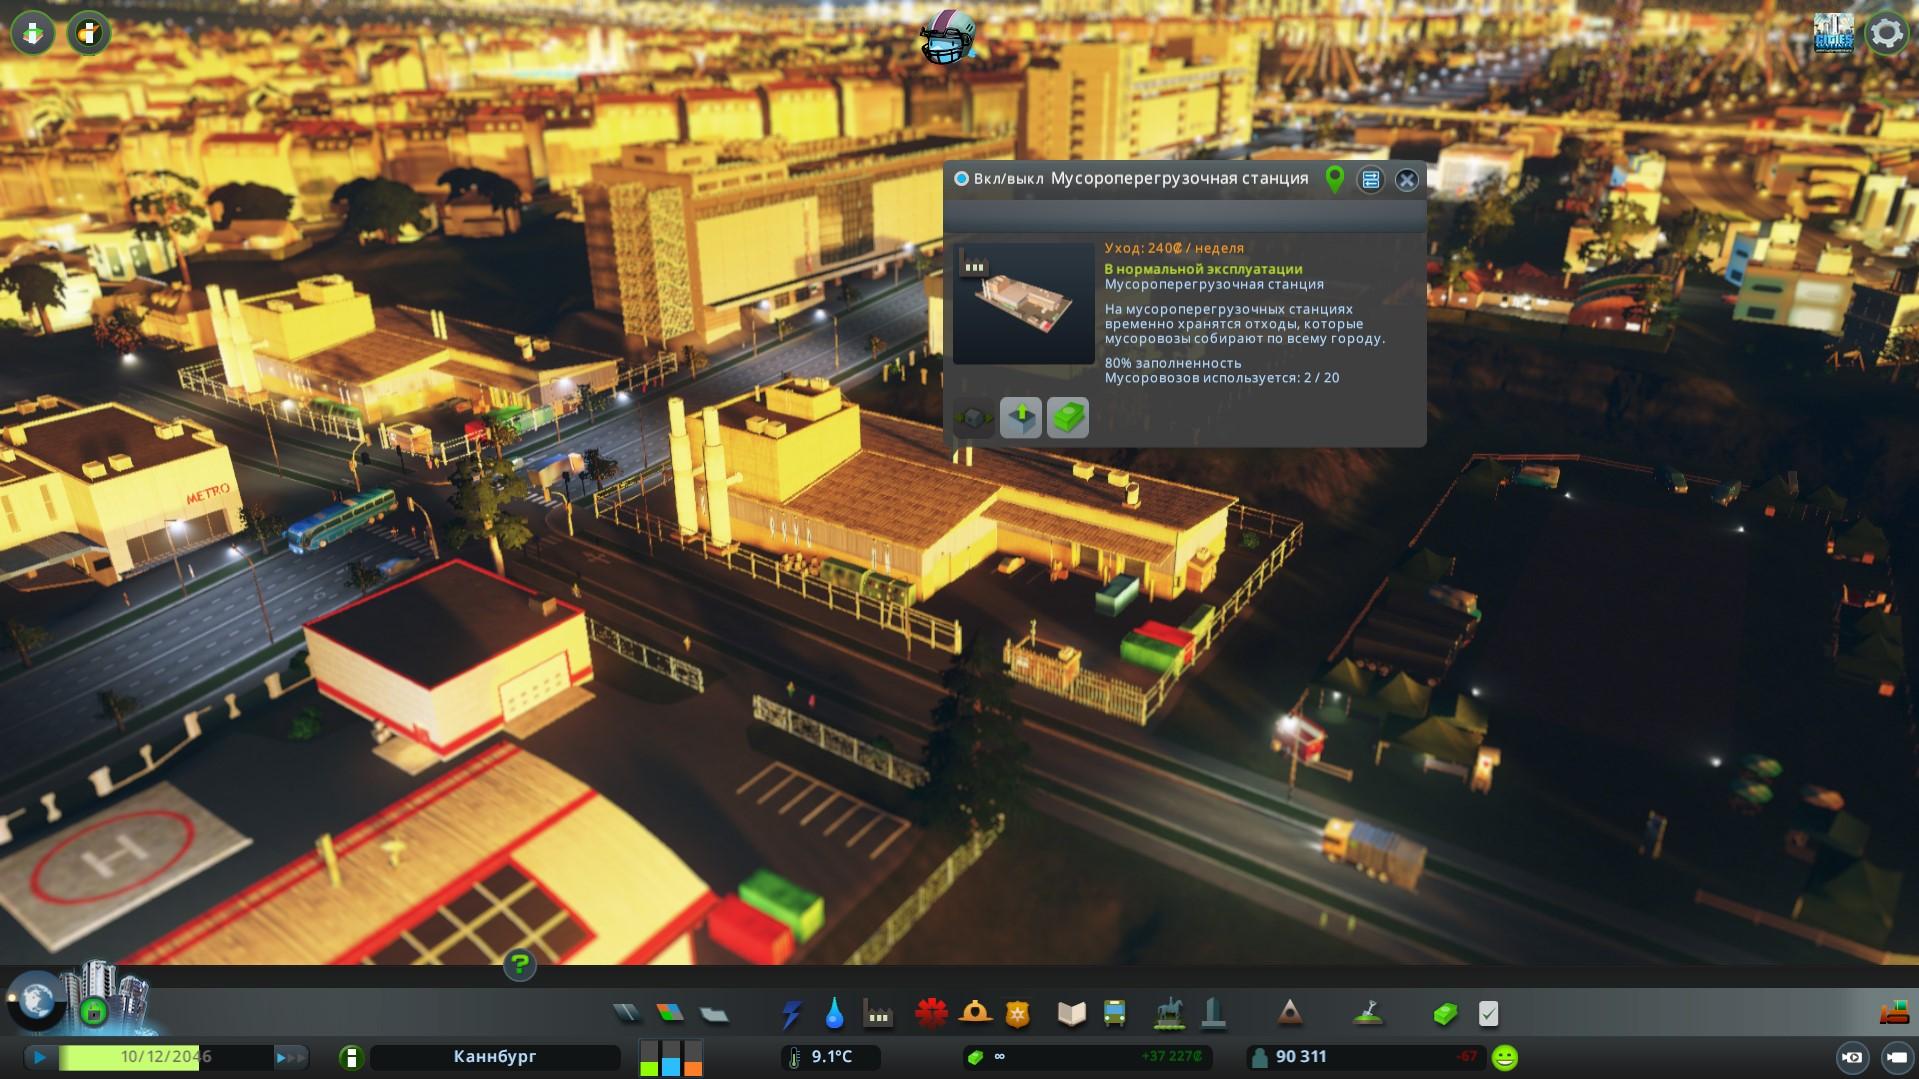 Мусороперегрузочная станция cities skylines